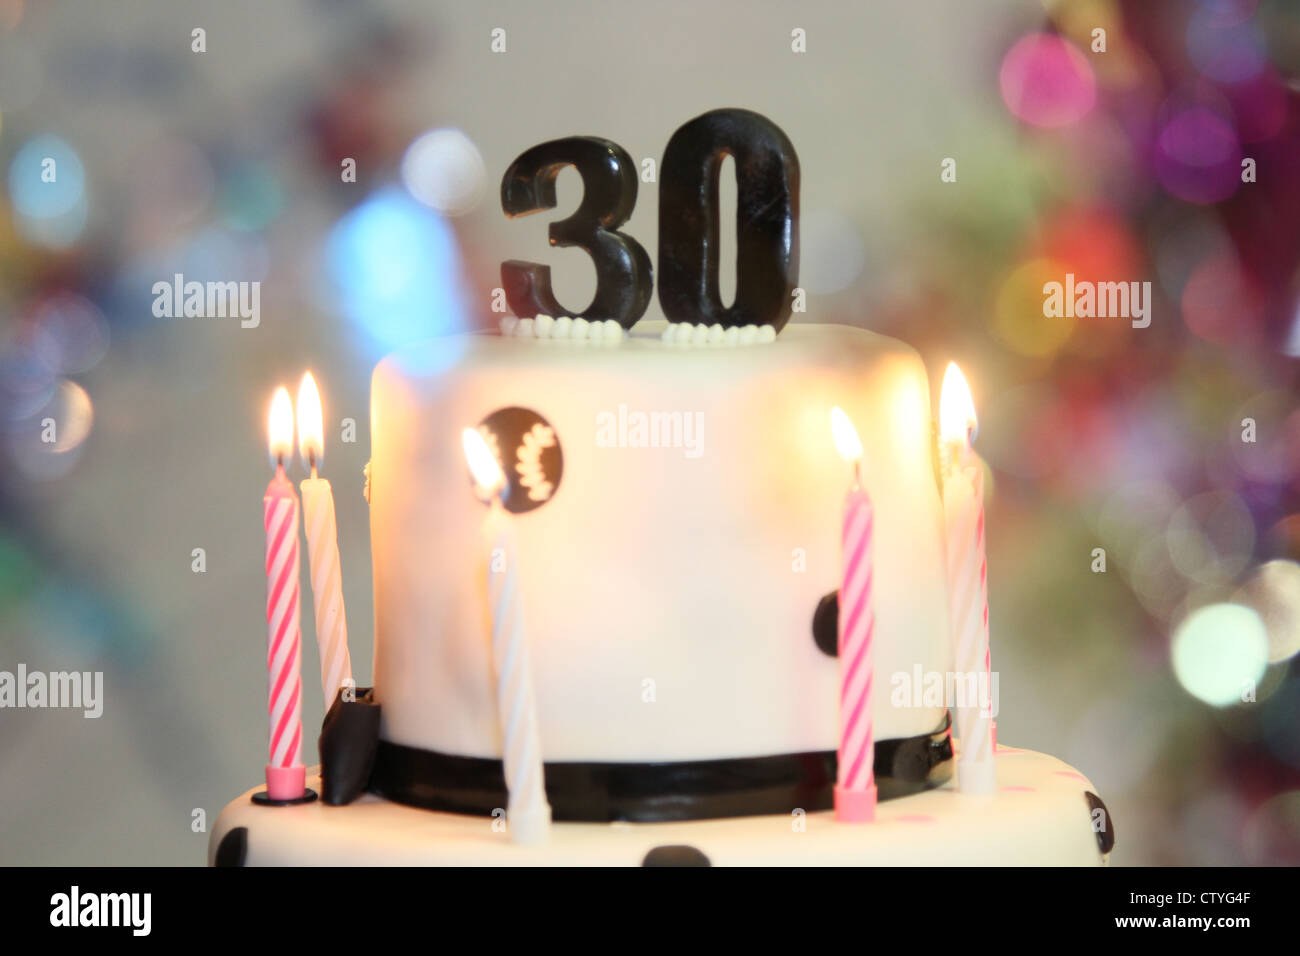 Geburtstagskuchen Kerzen 30 30 Stockfoto Bild 49777855 Alamy